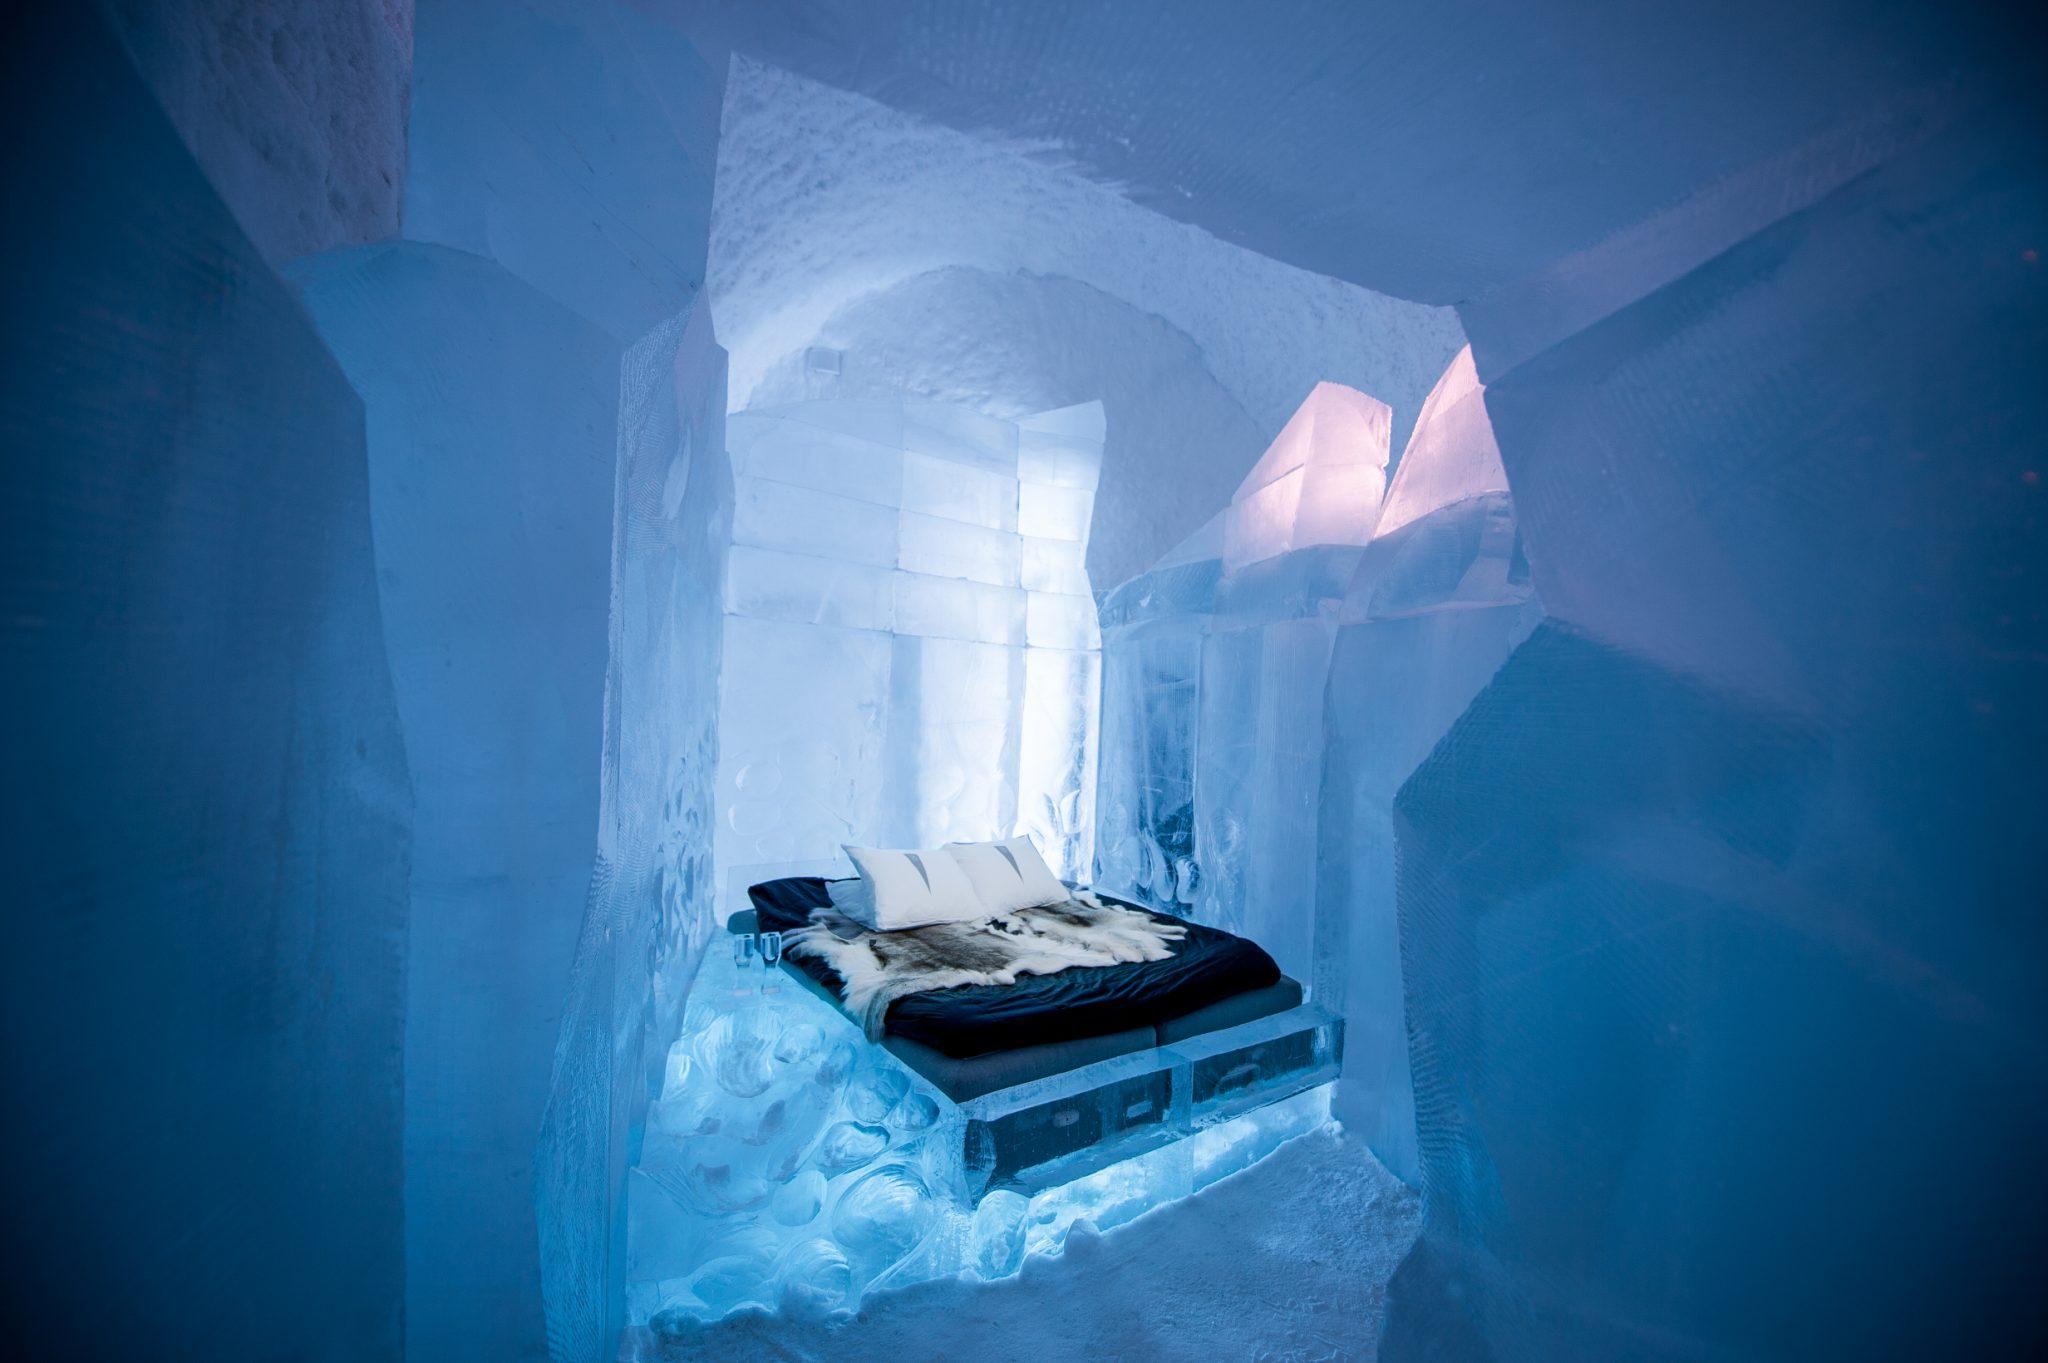 Artistas- Luca Roncorong & Dave Ruane, icehotel 365 - Photo Credits: Asaf Kliger